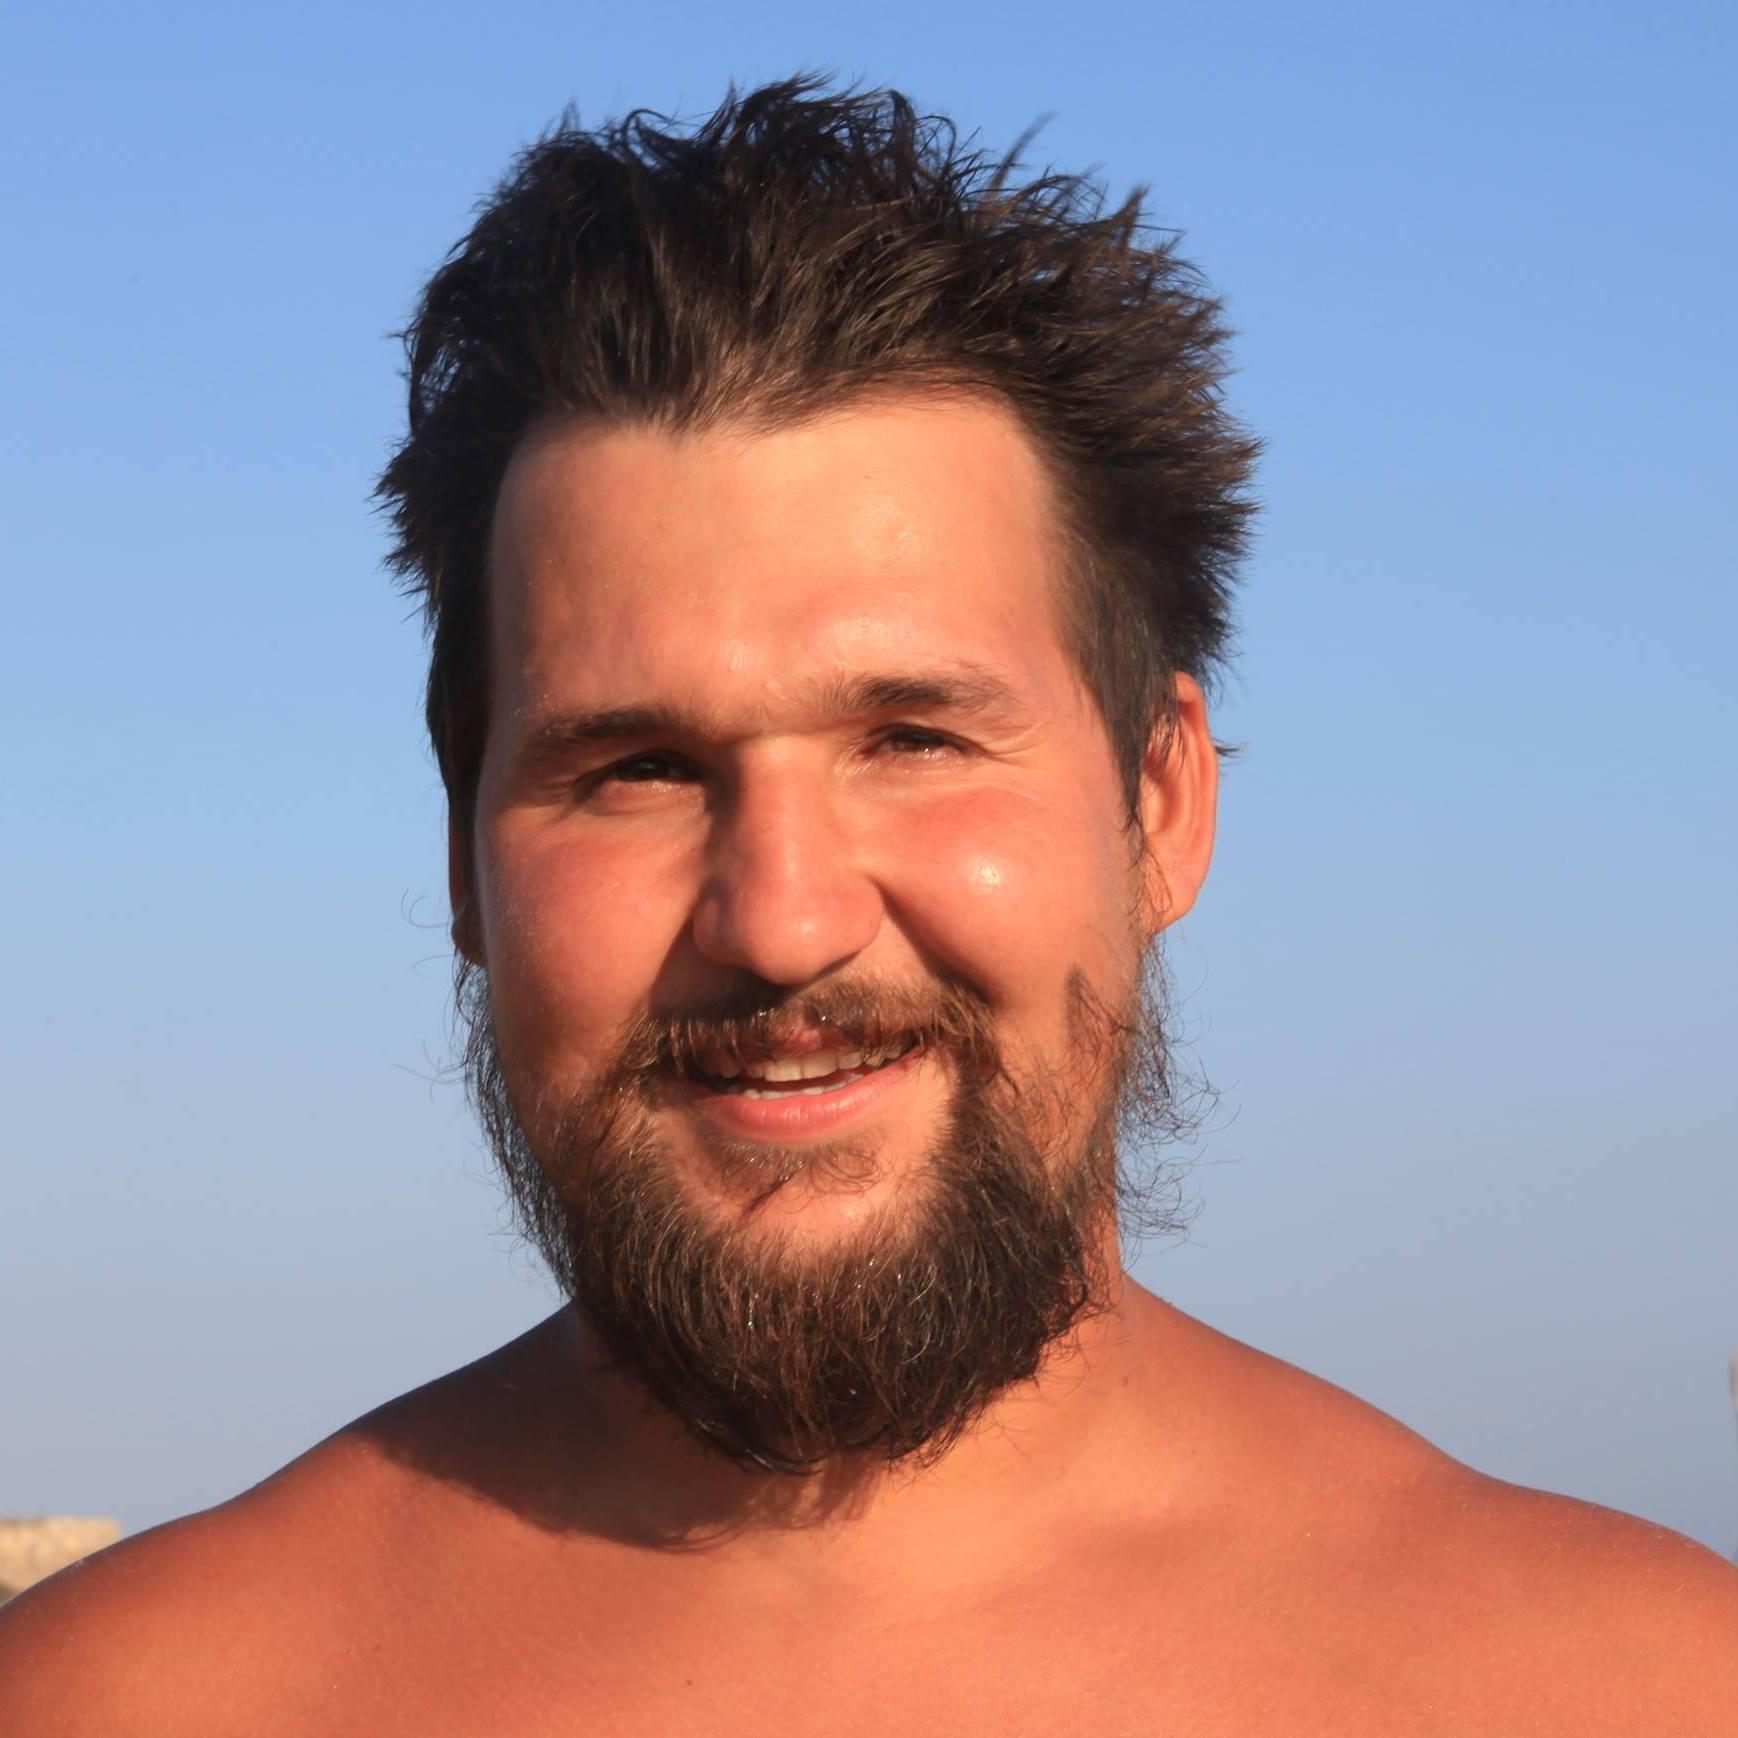 Volodymyr Sierov